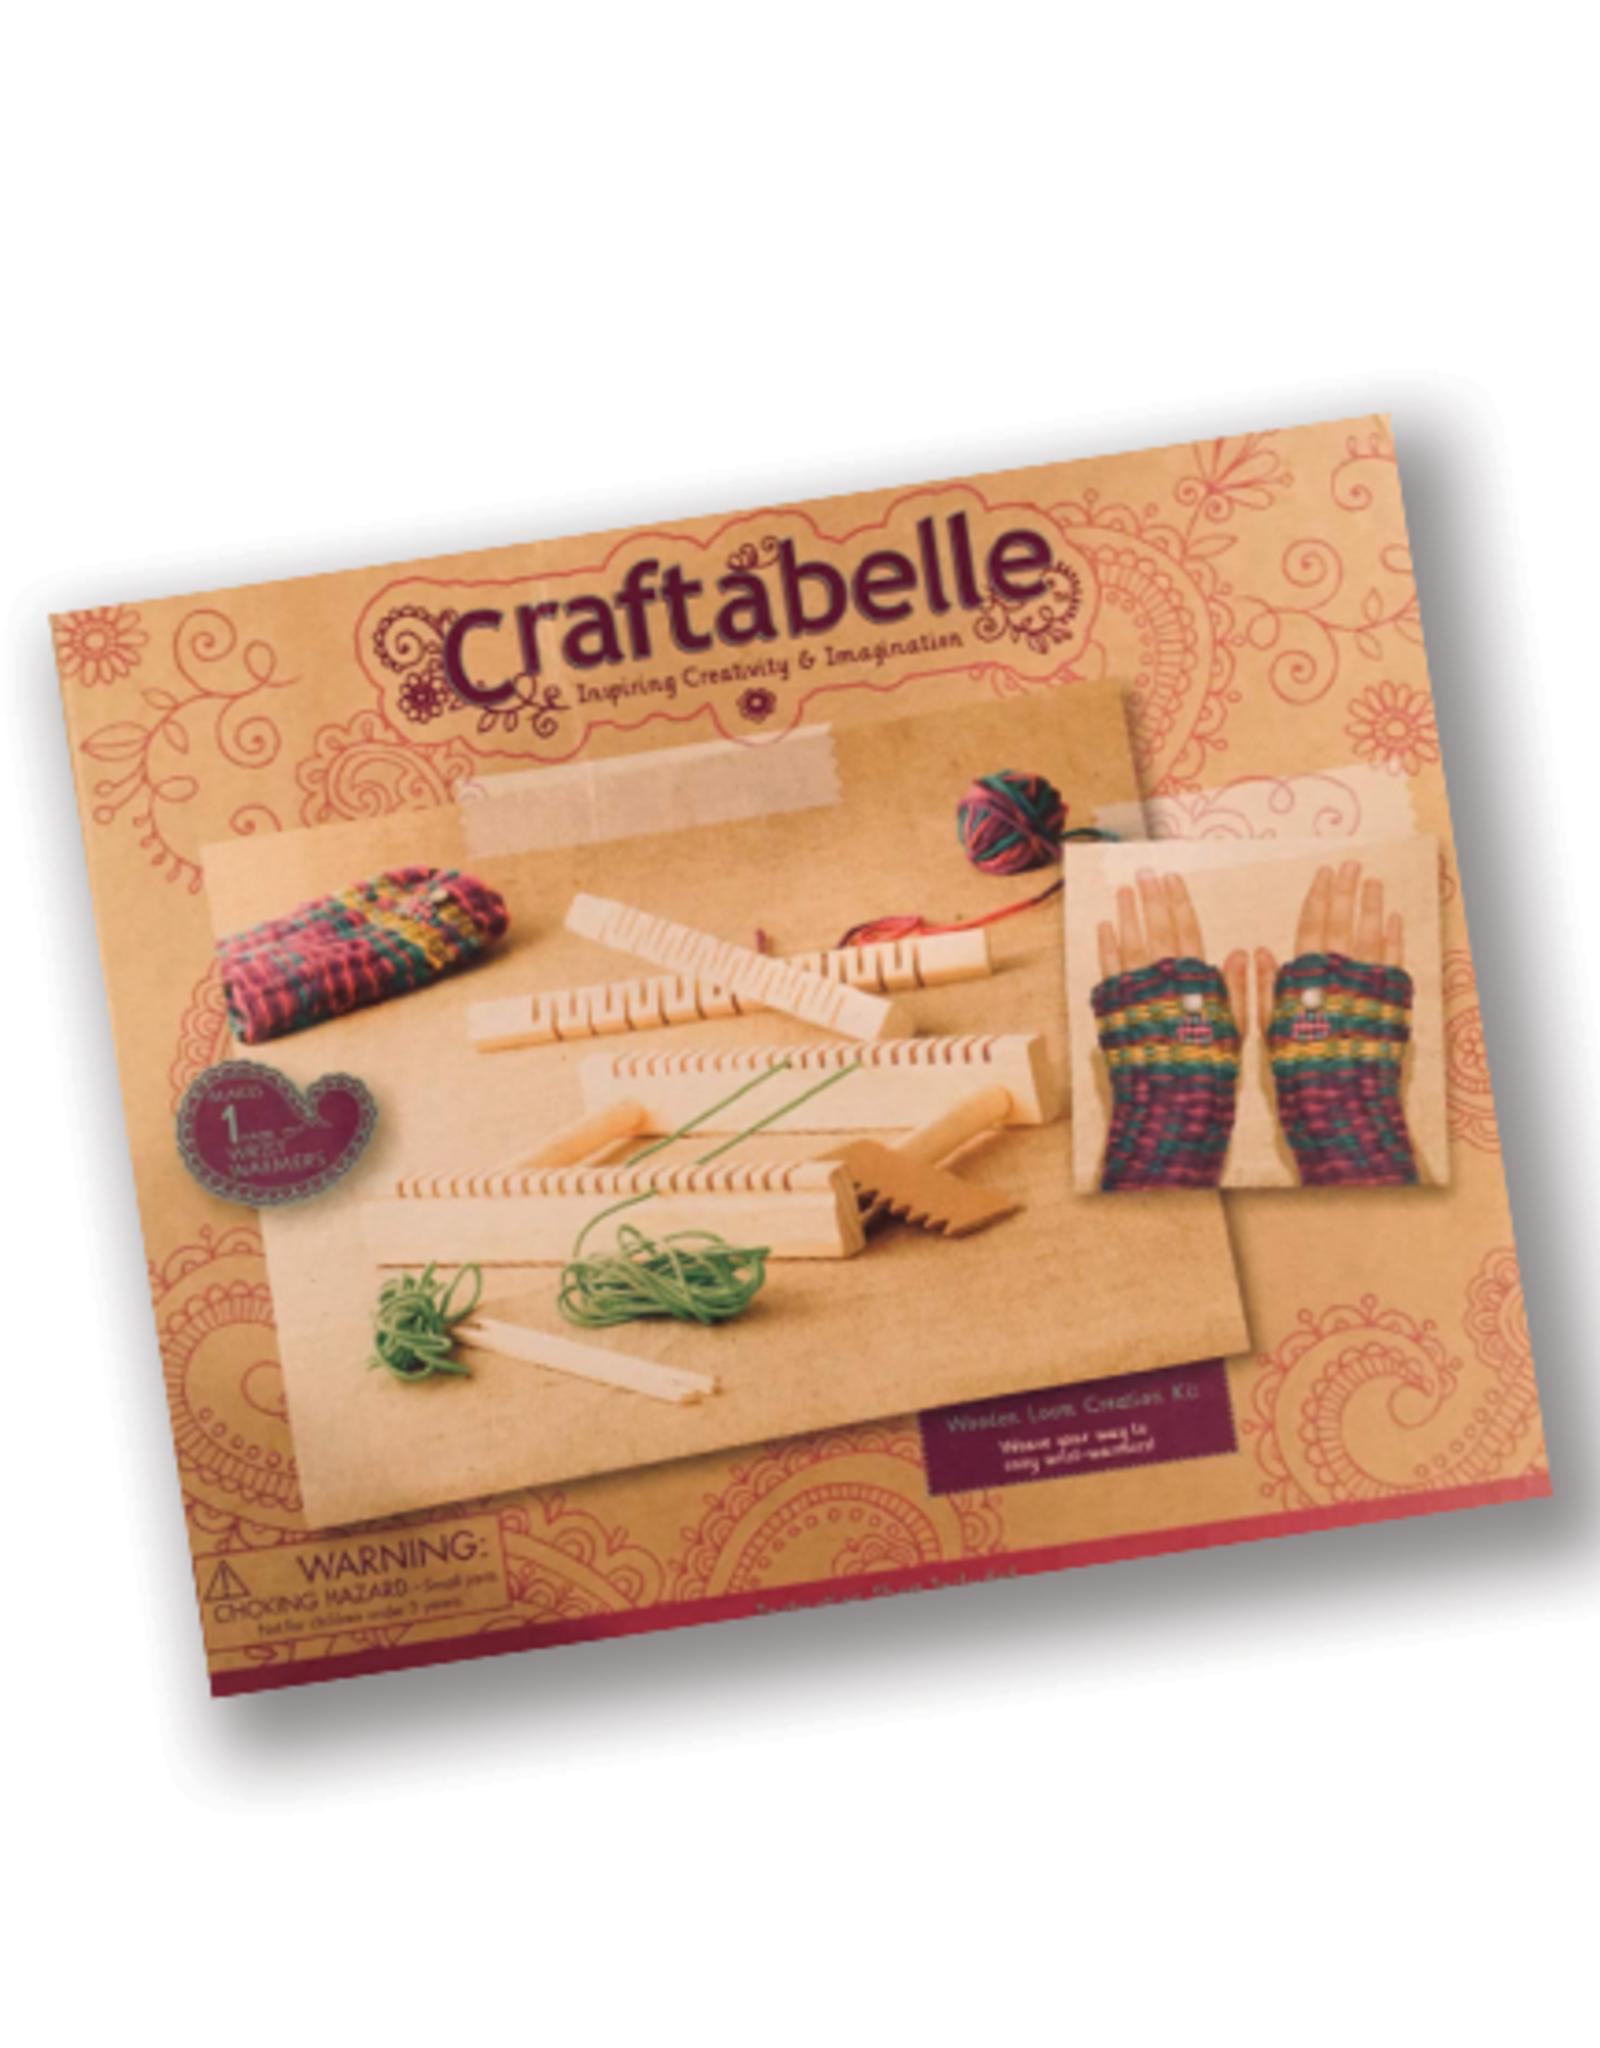 Craftabelle Wooden Loom Creation Kit